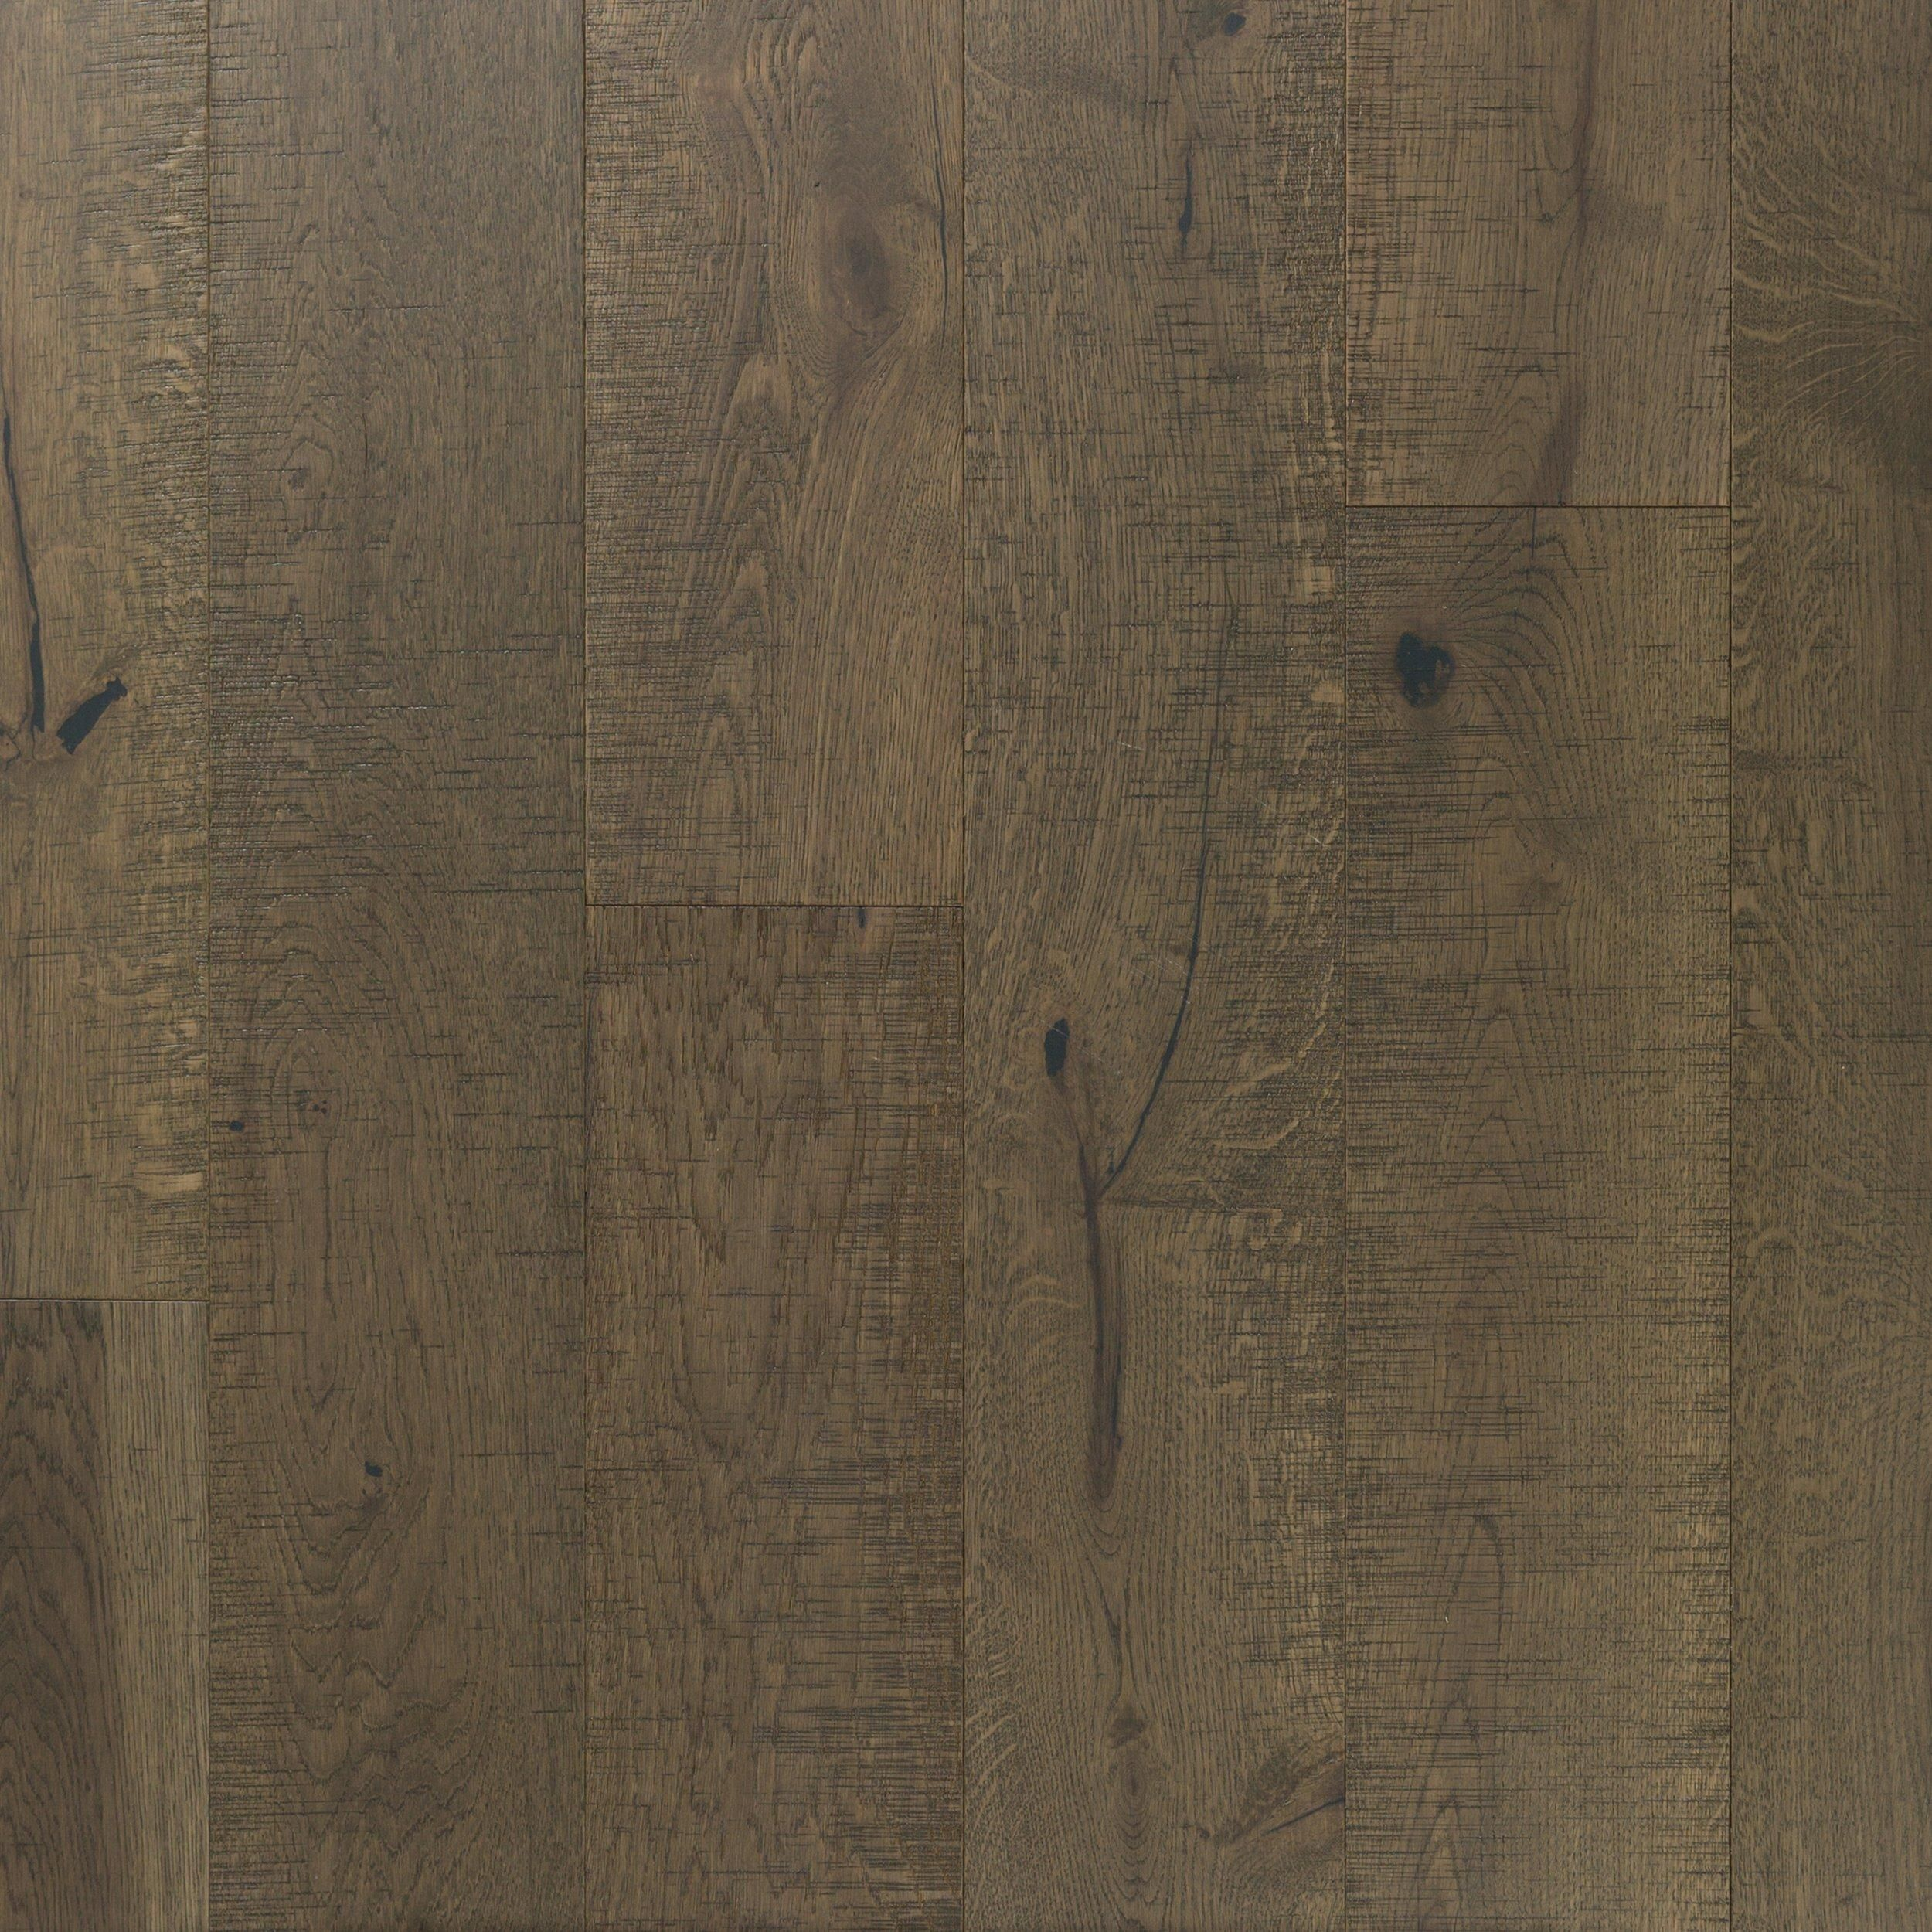 White Oak Dockside Locking Engineered Hardwood In 2020